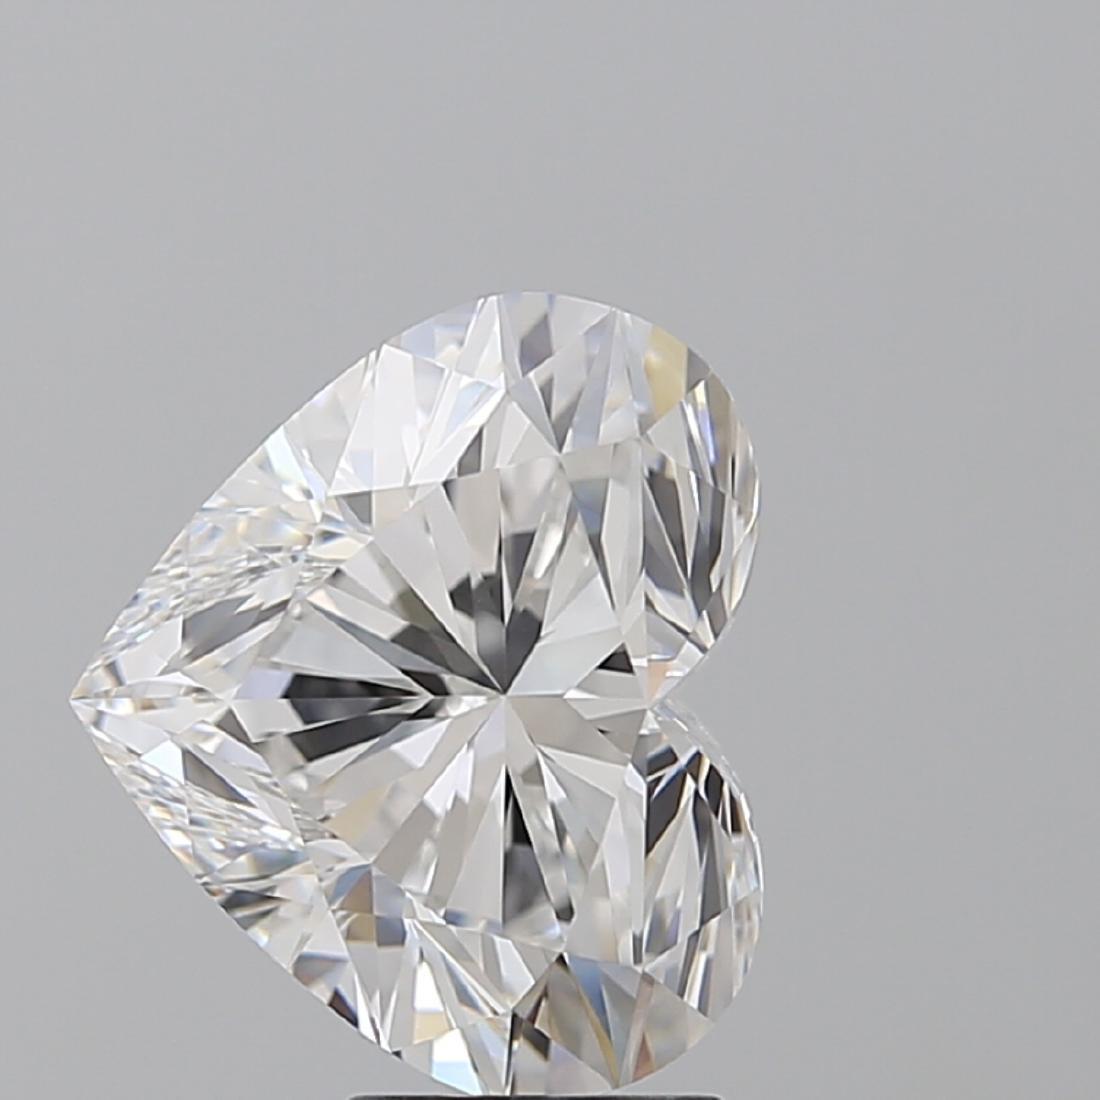 5.01 ct, Color F/VVS2, Heart cut Diamond - 2